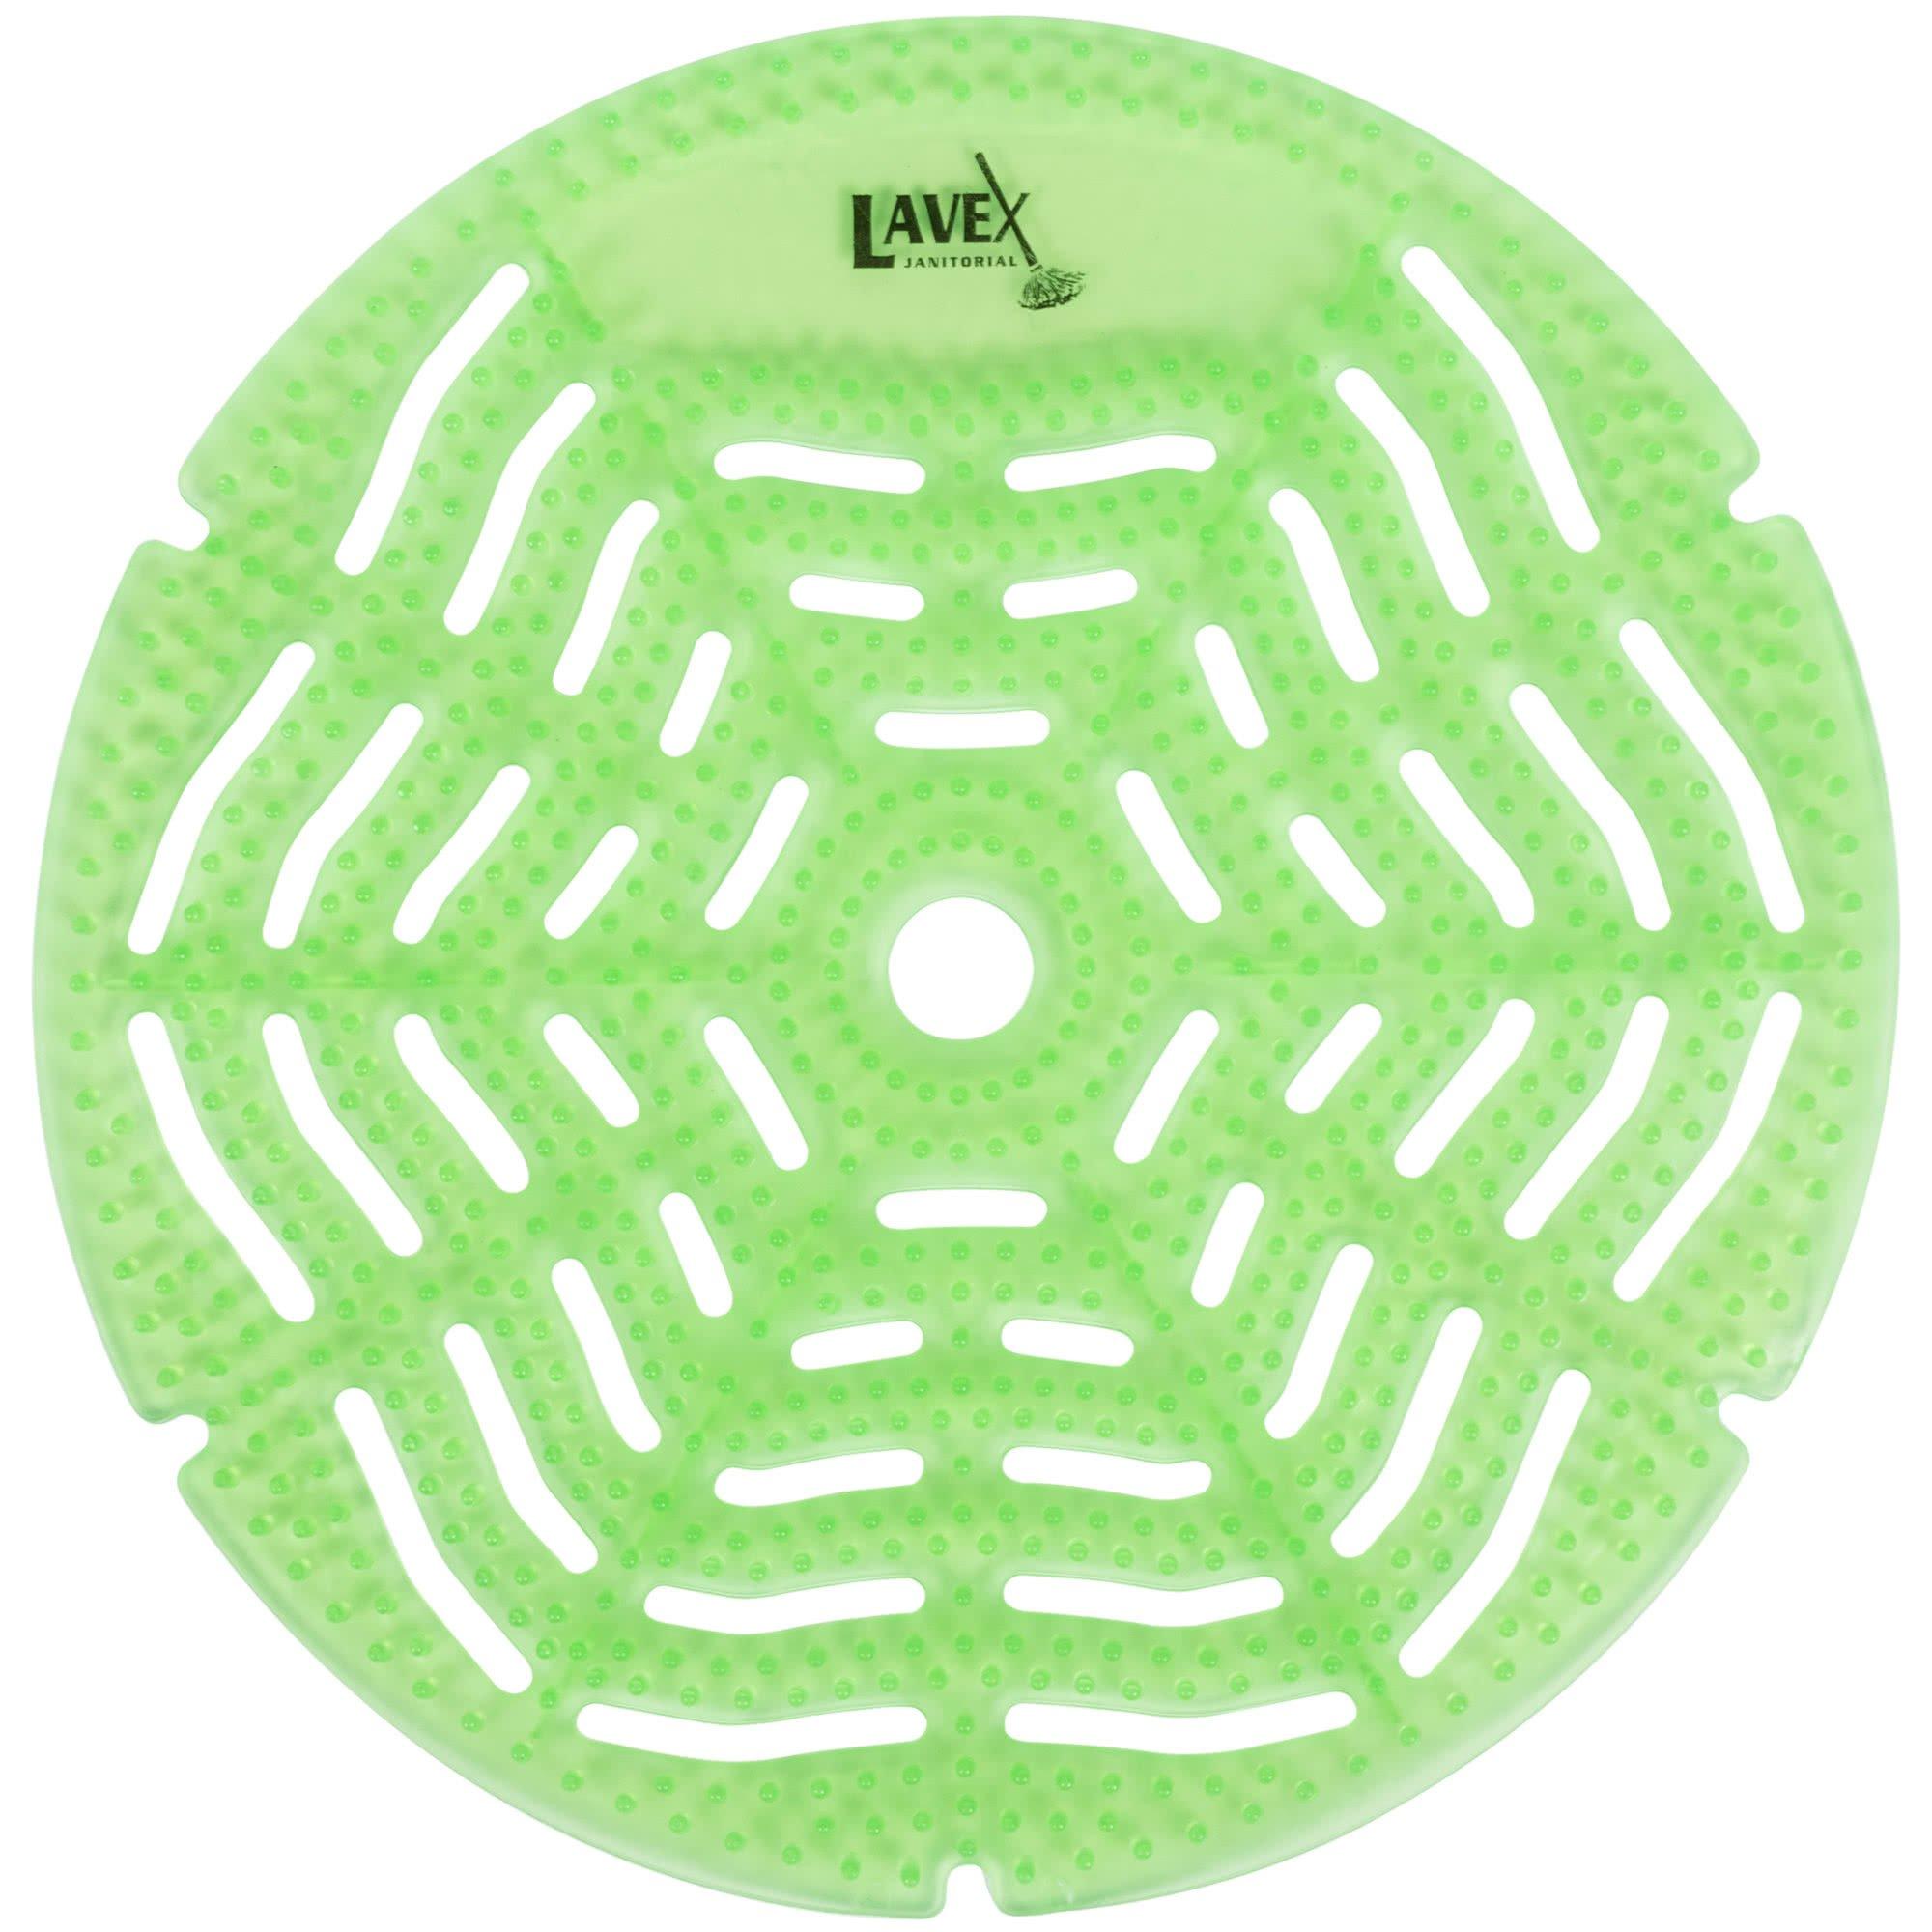 Lavex Gel Urinal Screen | Bathroom Deodorizing | Green Apple Scented 10 pack